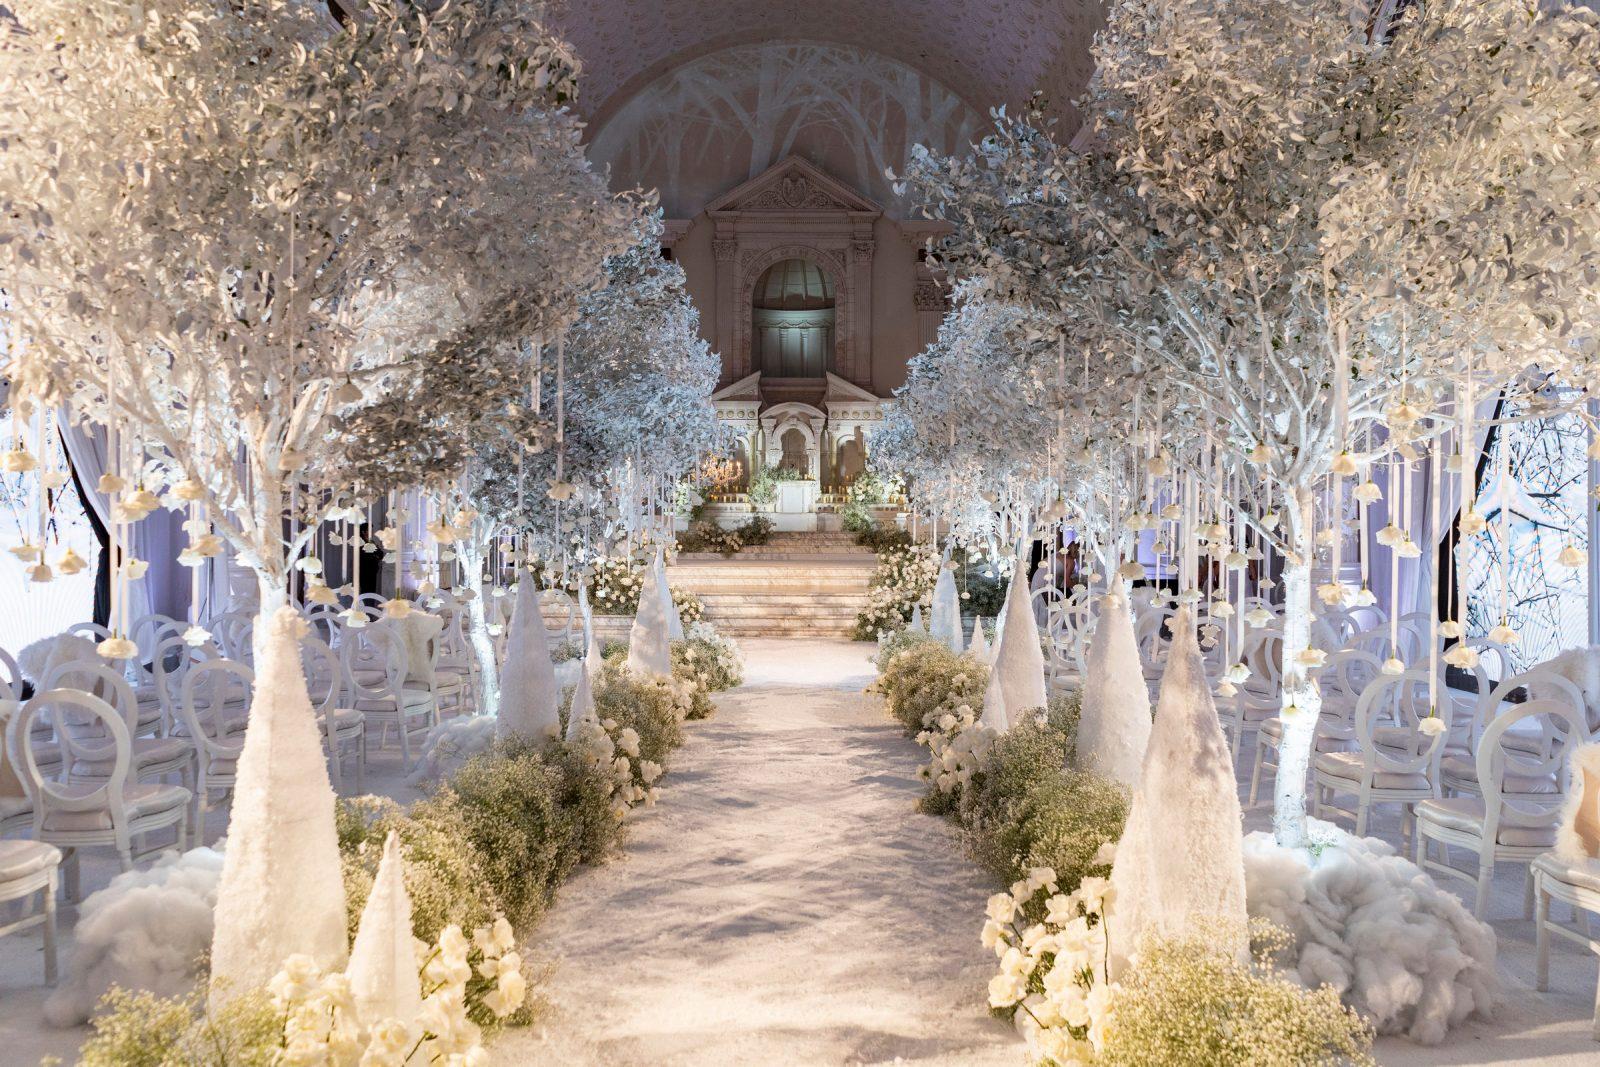 Selling Sunset's Christine Quinn's Gothic Winter Wonderland Wedding